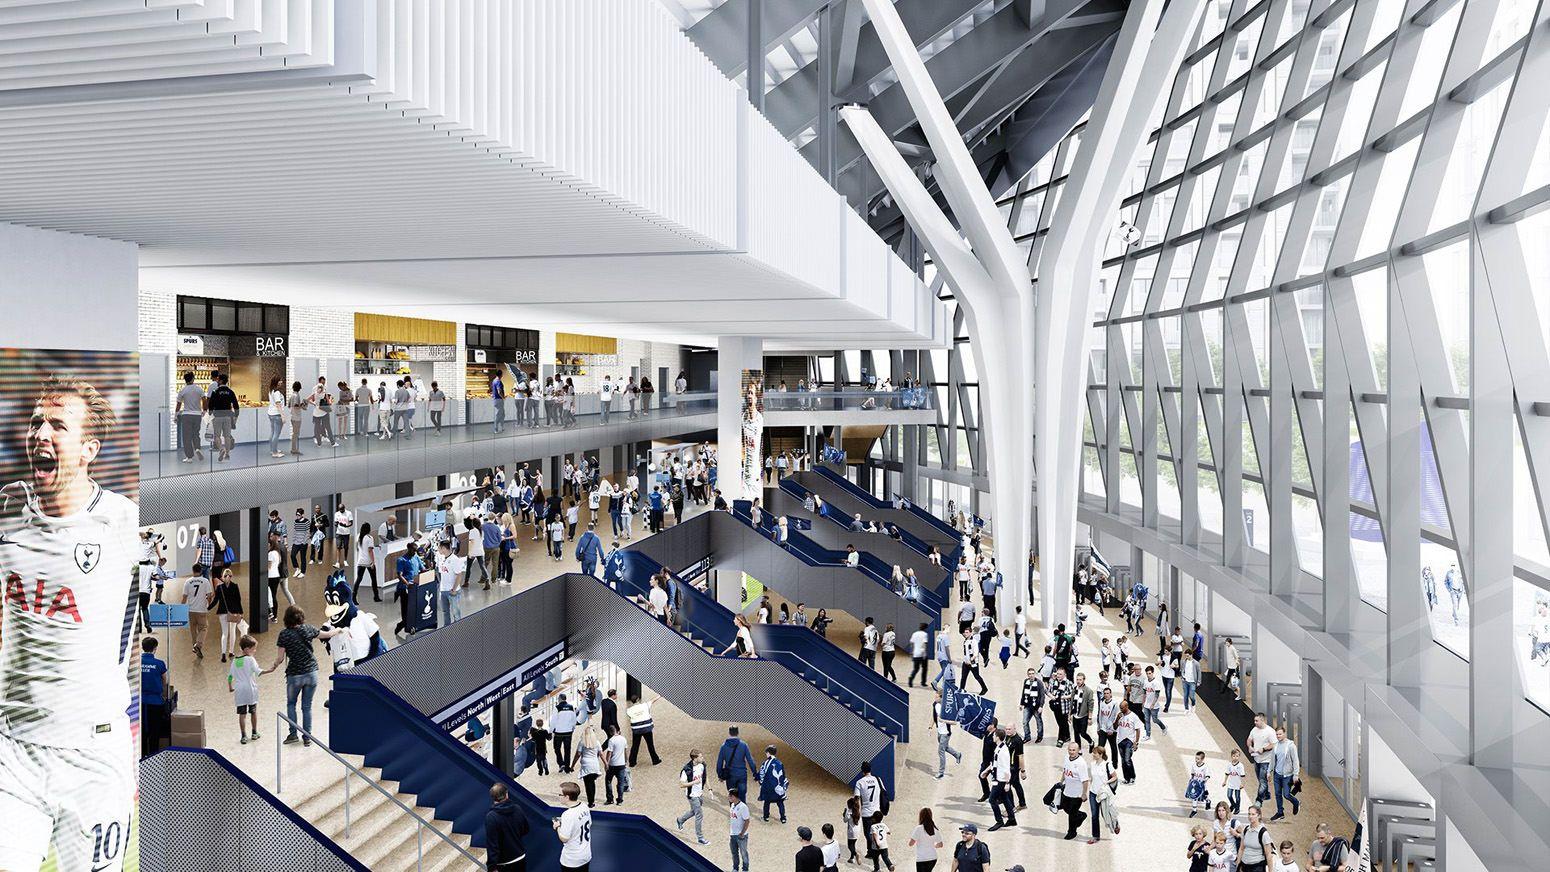 London New White Hart Lane 61 559 Page 2309 Skyscrapercity Stadium Architecture Tottenham Hotspur Stadium